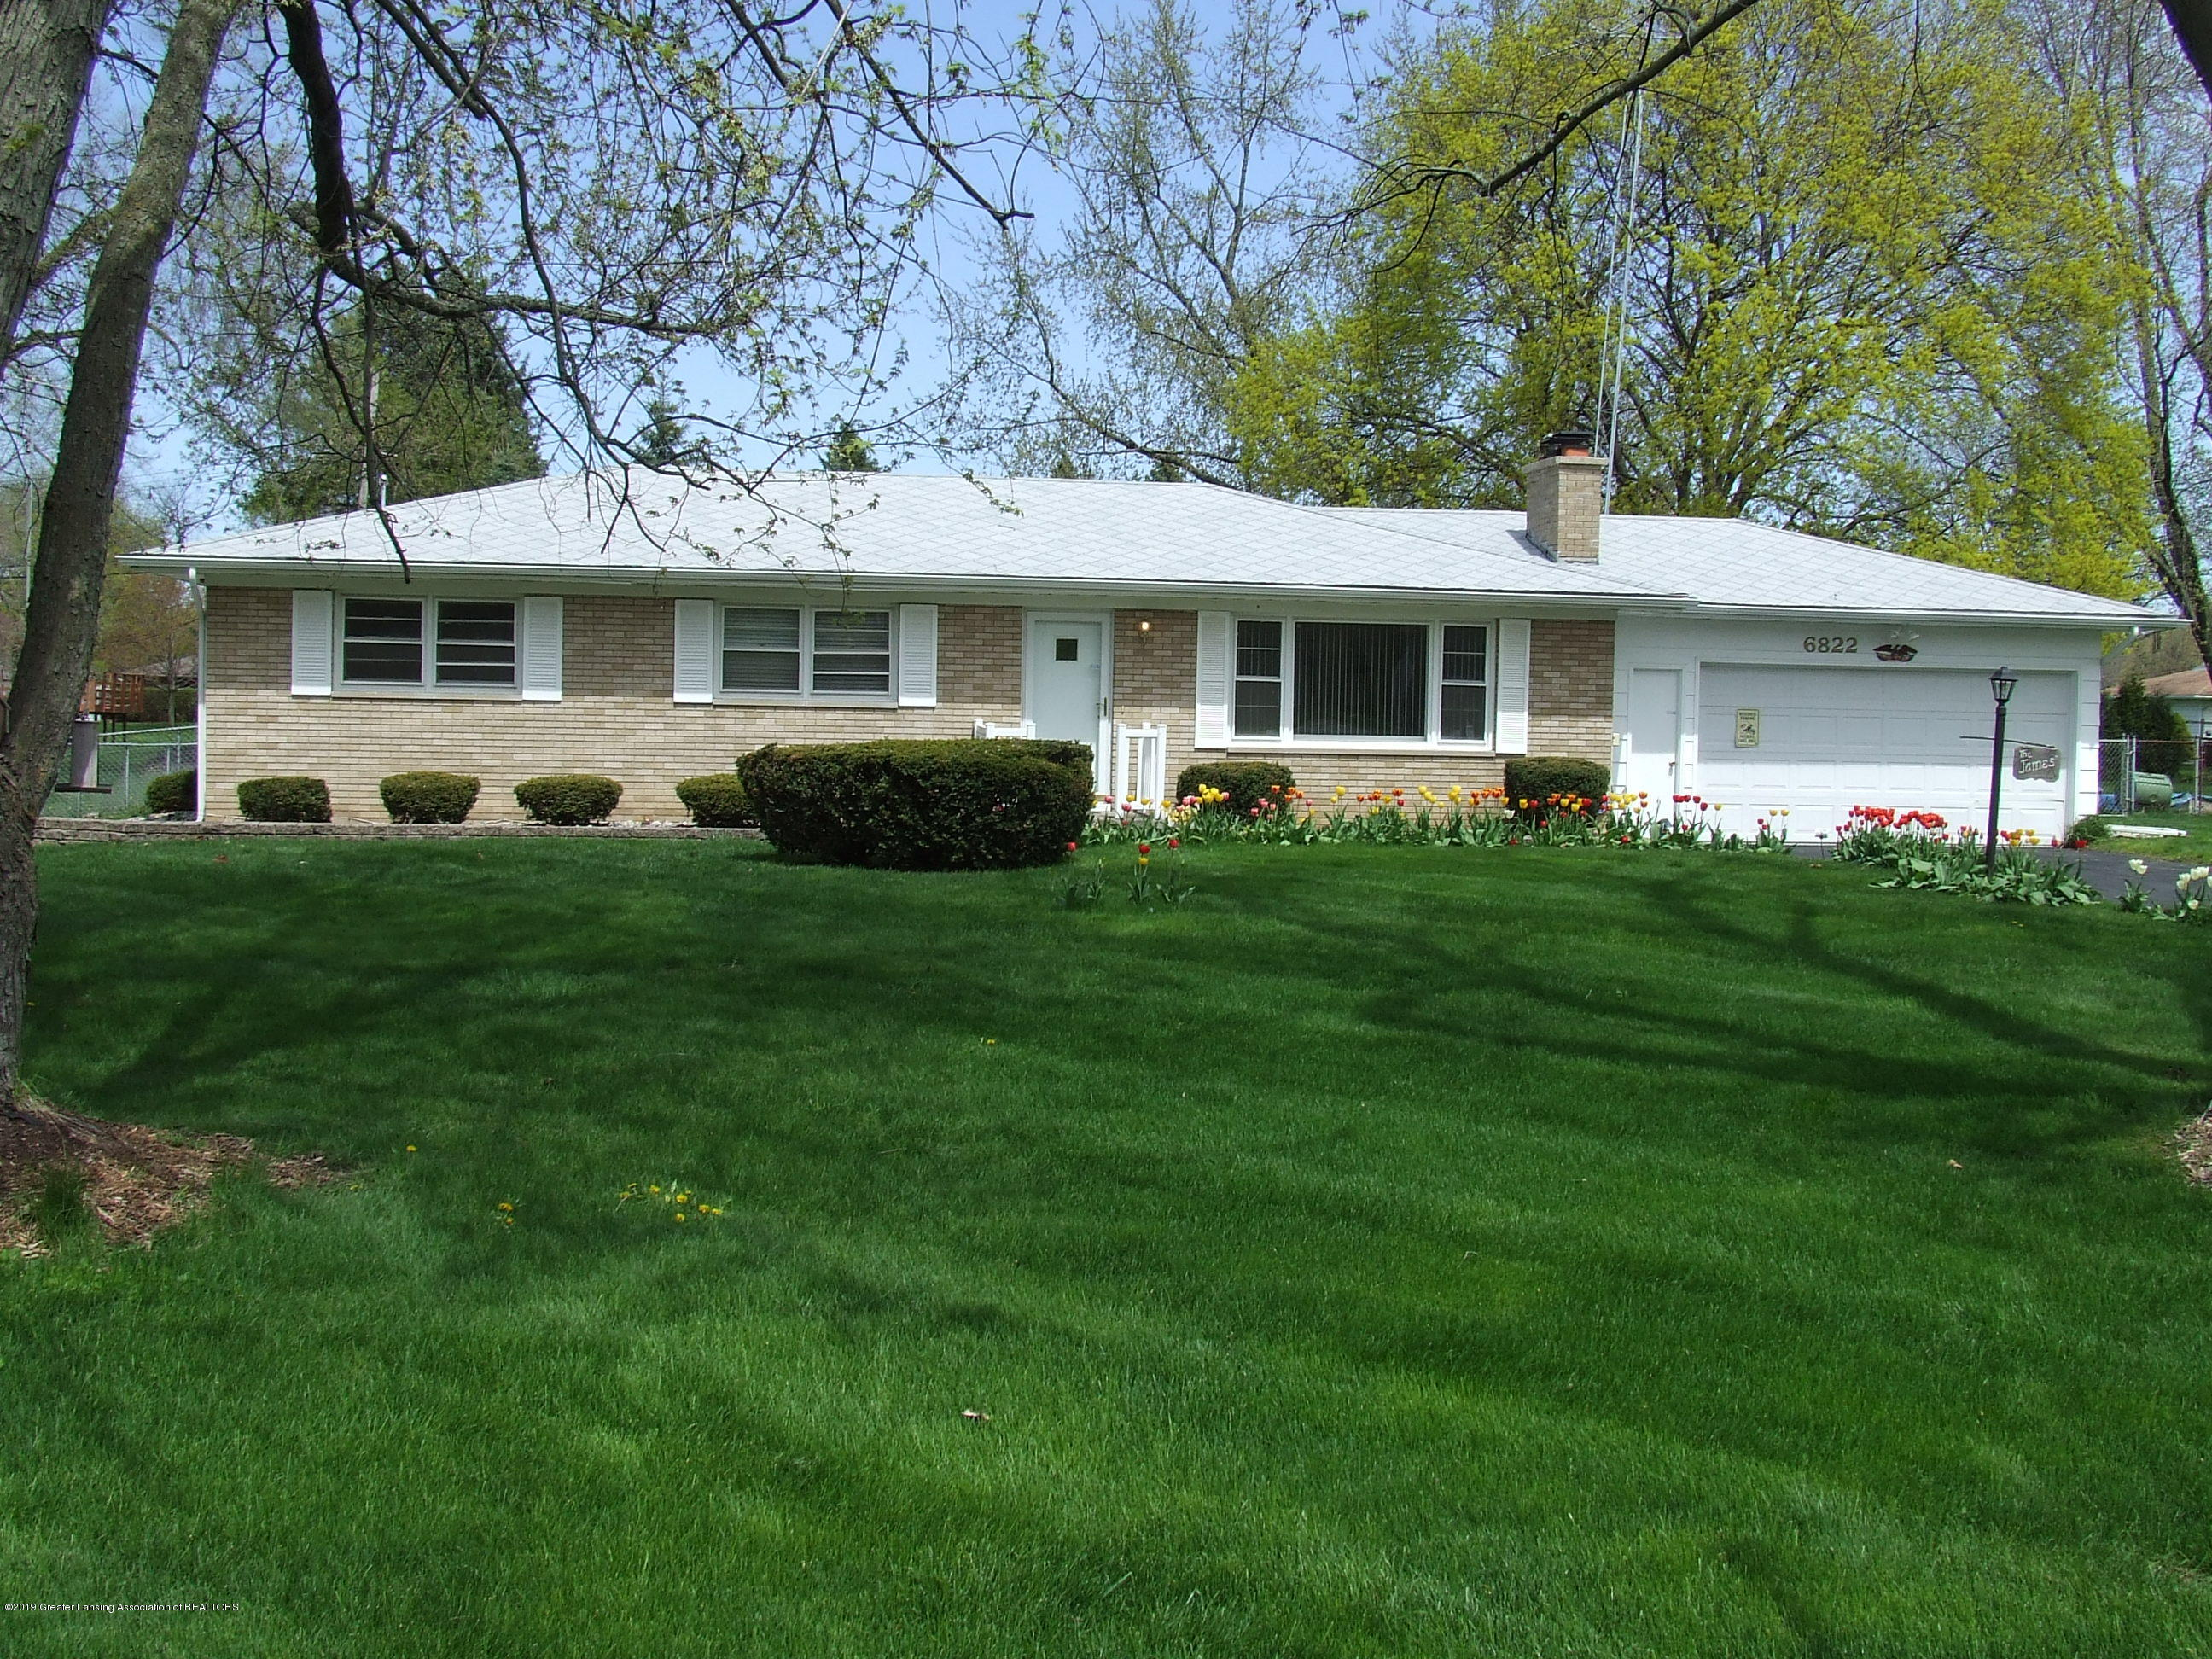 6822 W St Joe Hwy - Front exterior - 1